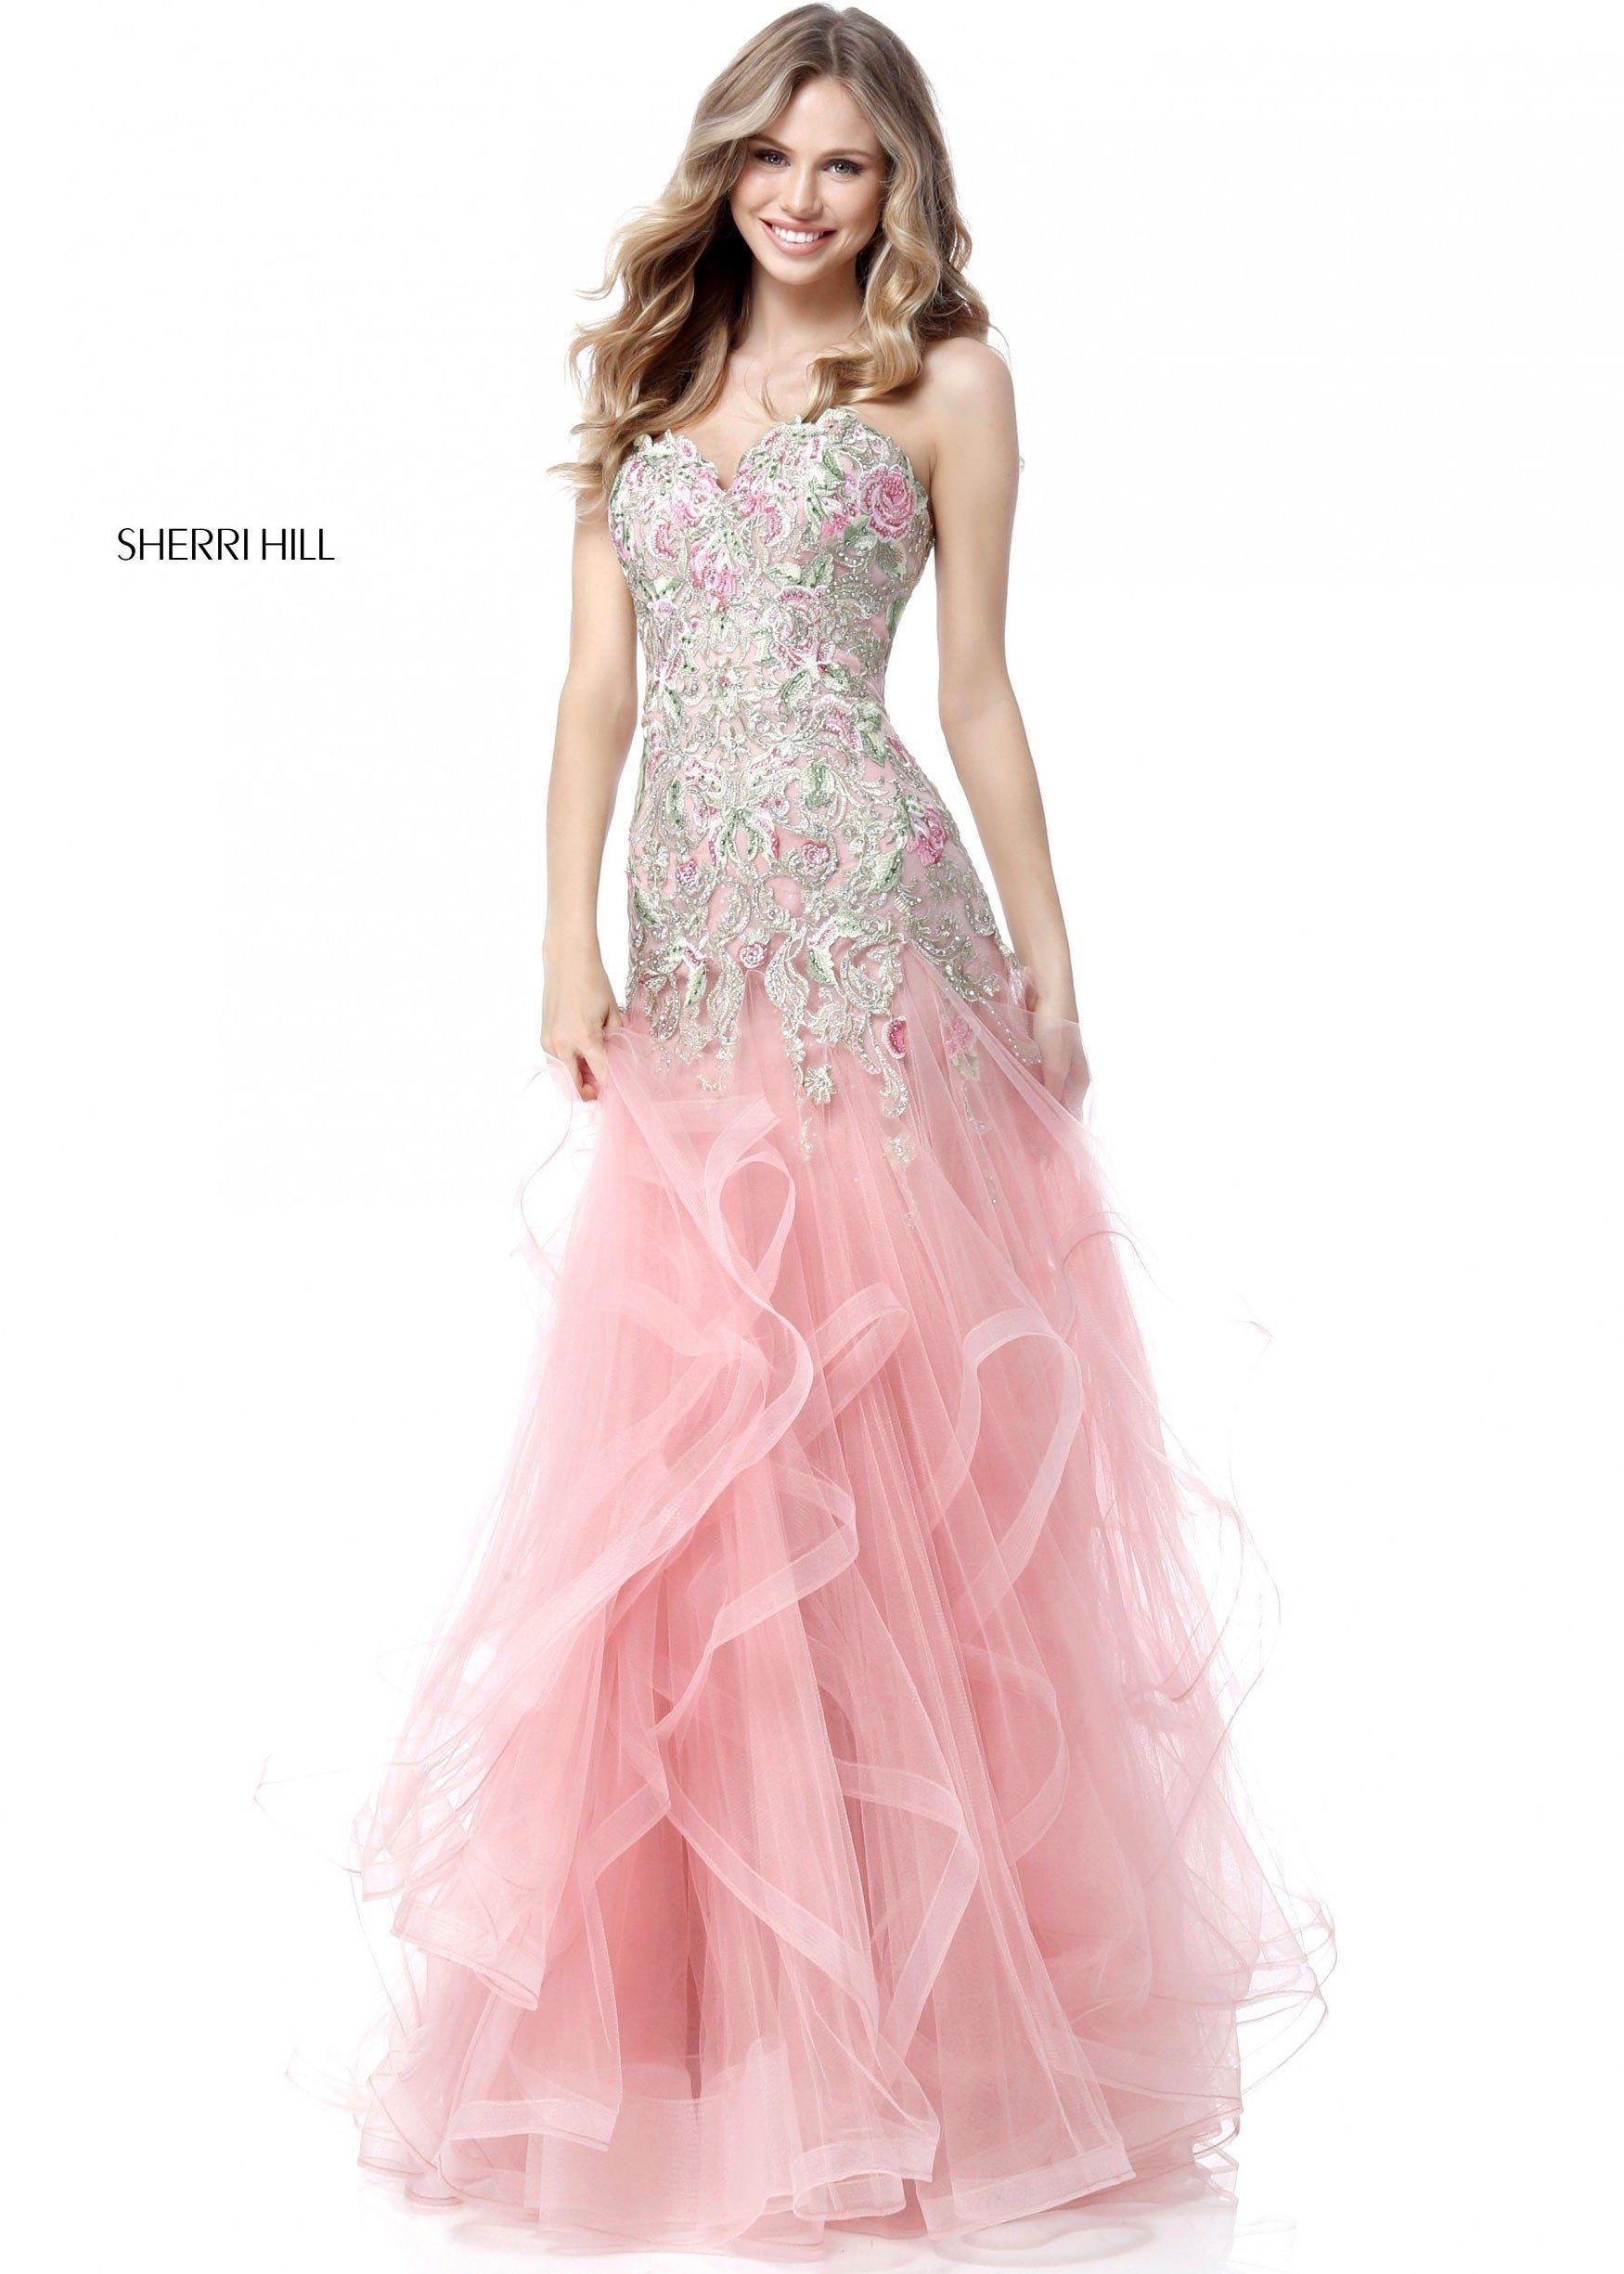 Sherri Hill 51719 Romantic Lace Tulle Ruffle Gown | Pinterest